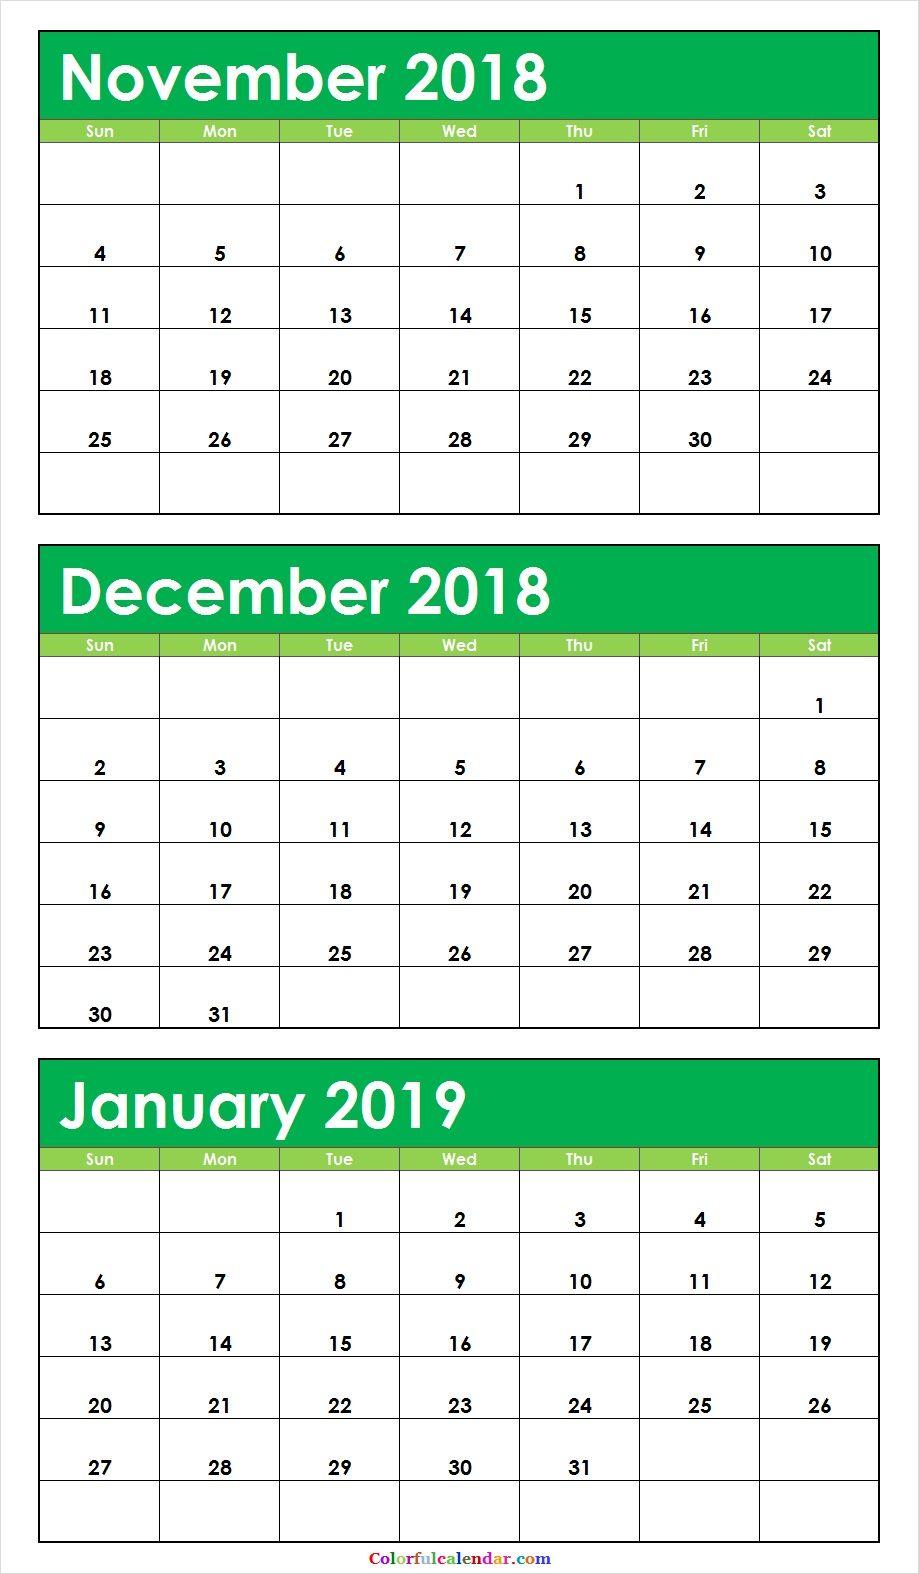 November December 2019 Monthly Calendar 3 Month November December 2018 January 2019 Calendar Green